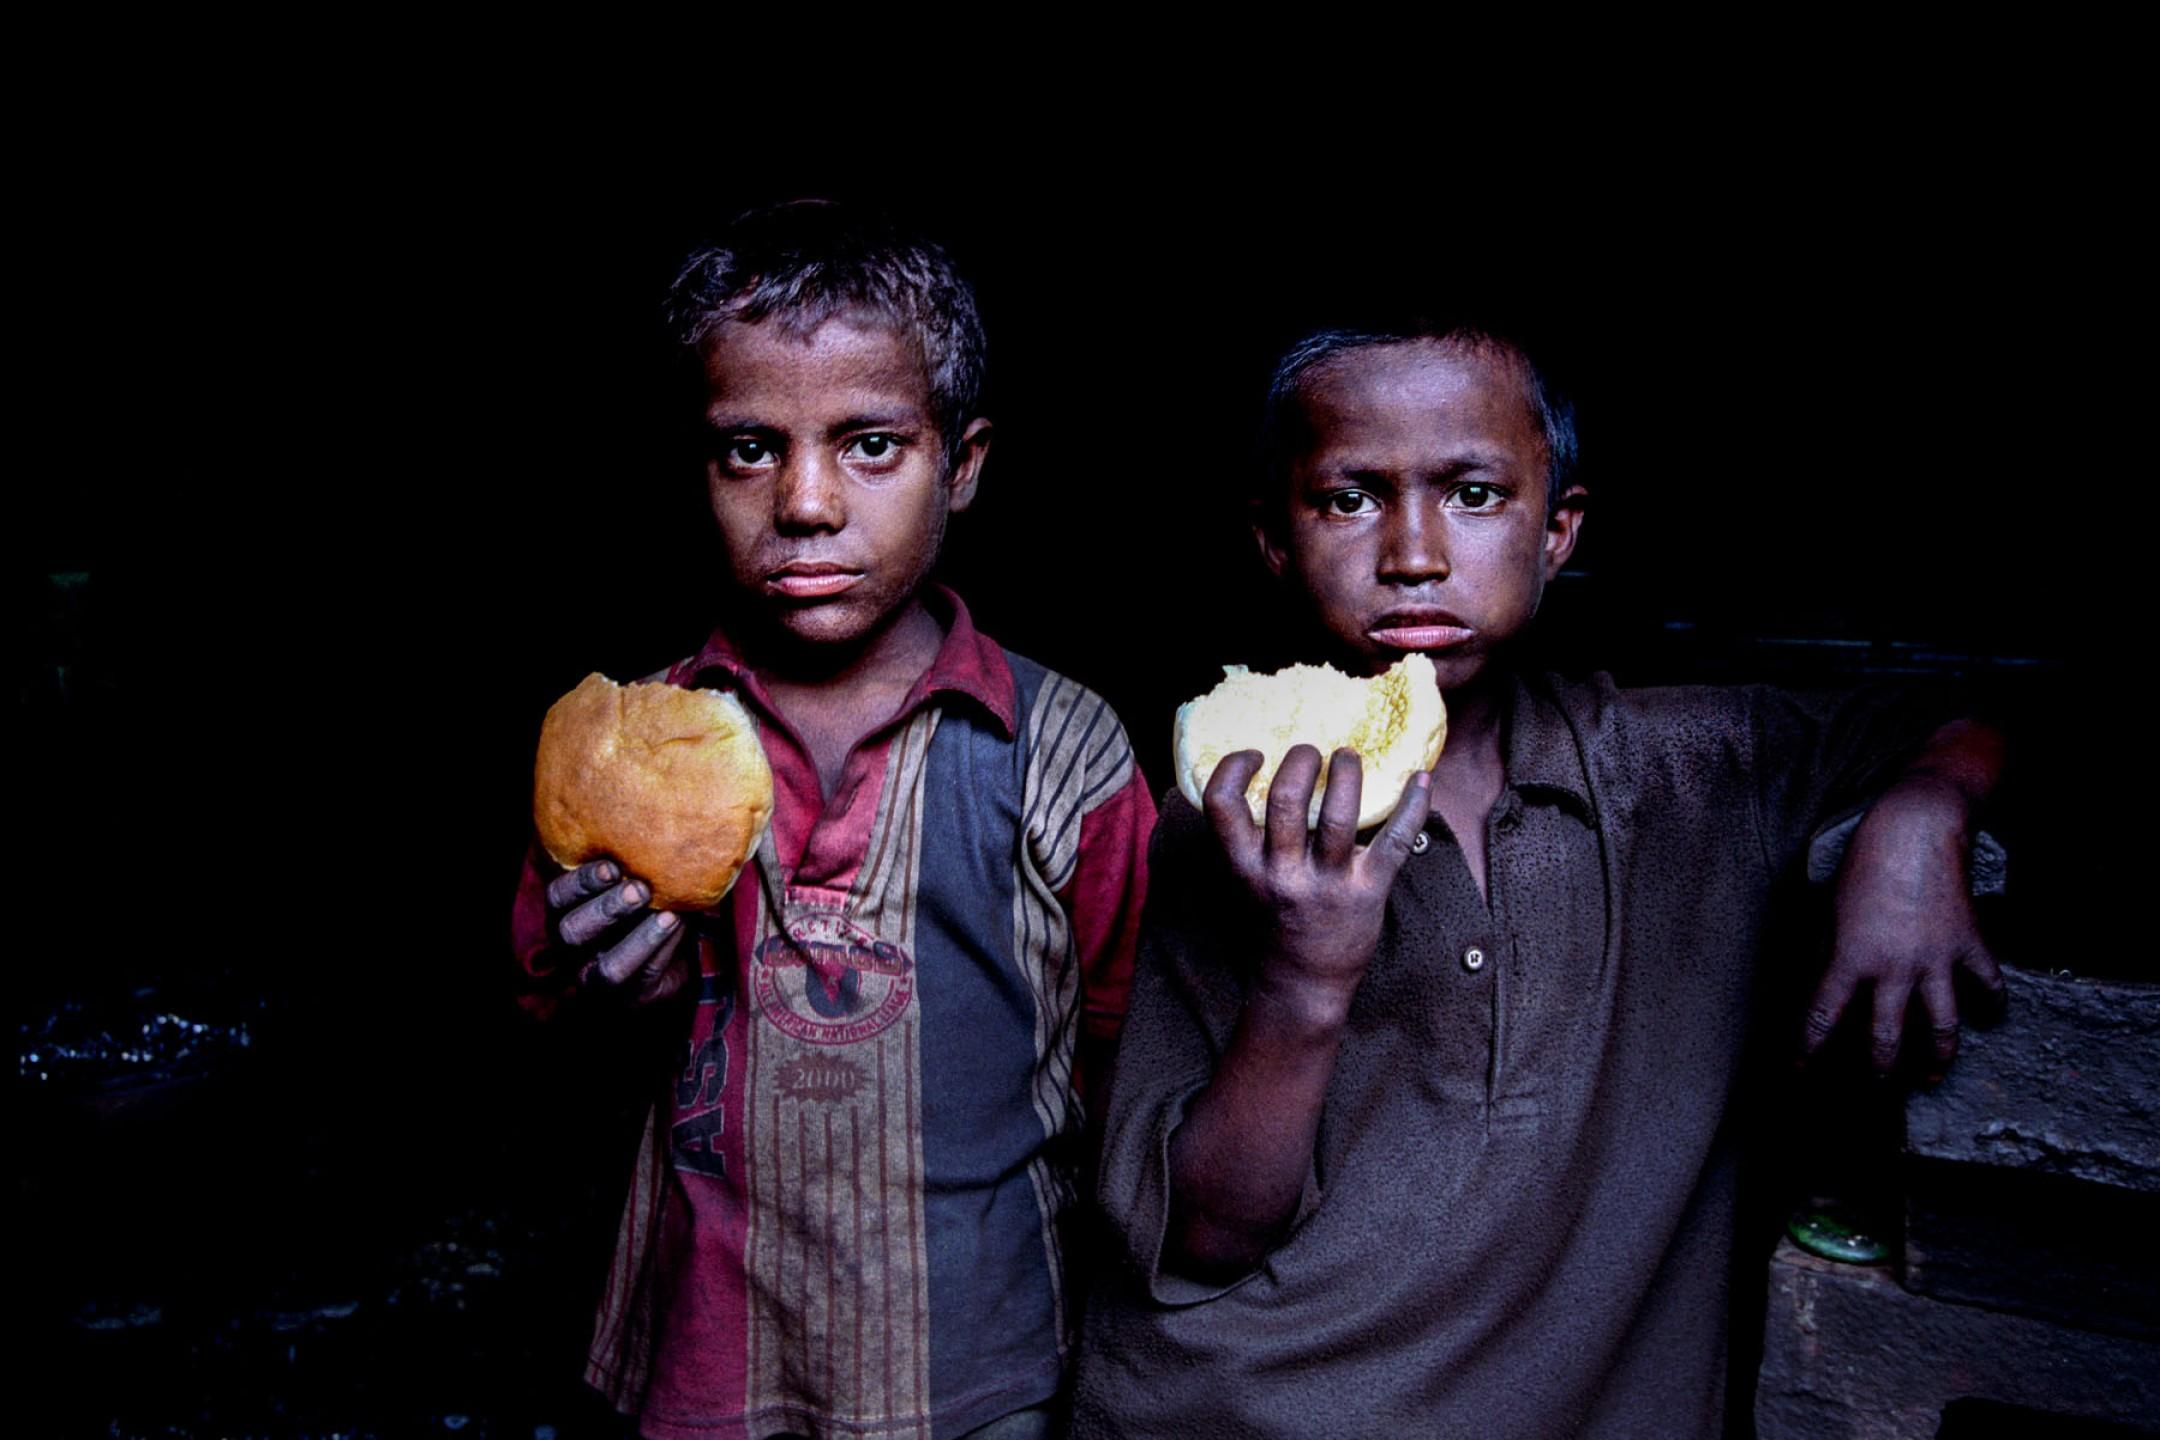 Child labour in Bangladesh